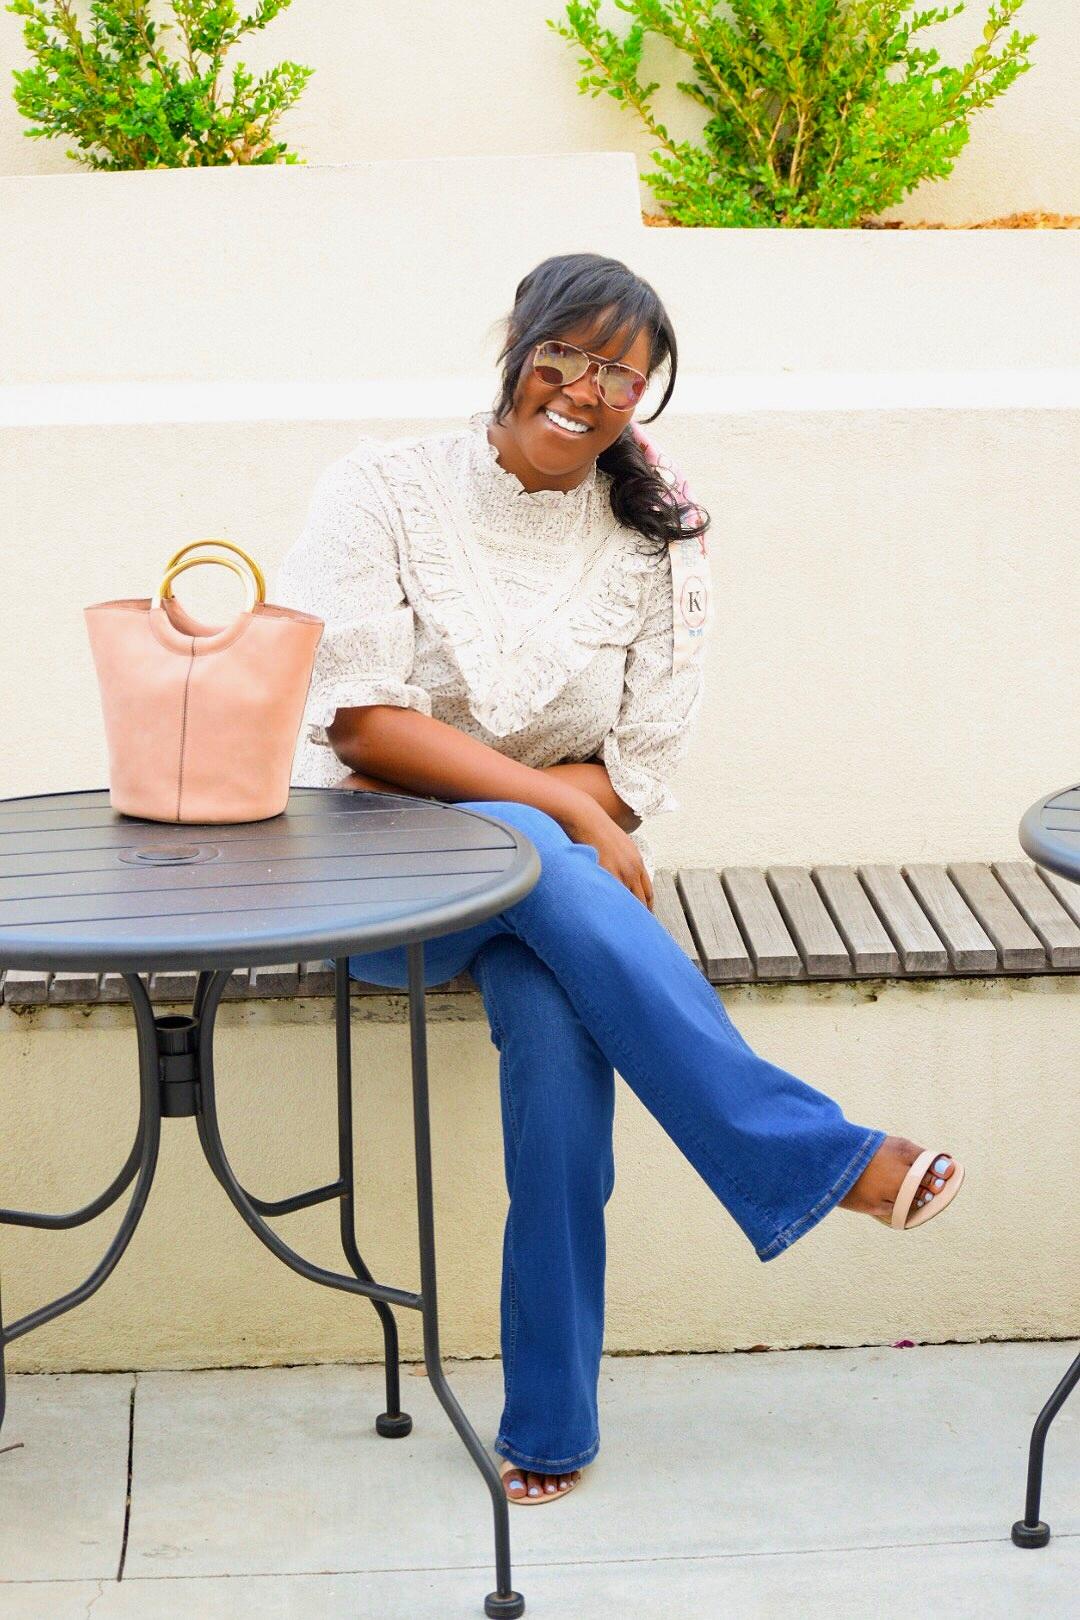 H&M Ruffle  Top  &  Sunnies , Zara  Jeans , Steve Madden  Heels , J Crew Purse (purchased last year), Dior Mitzah  Scarf